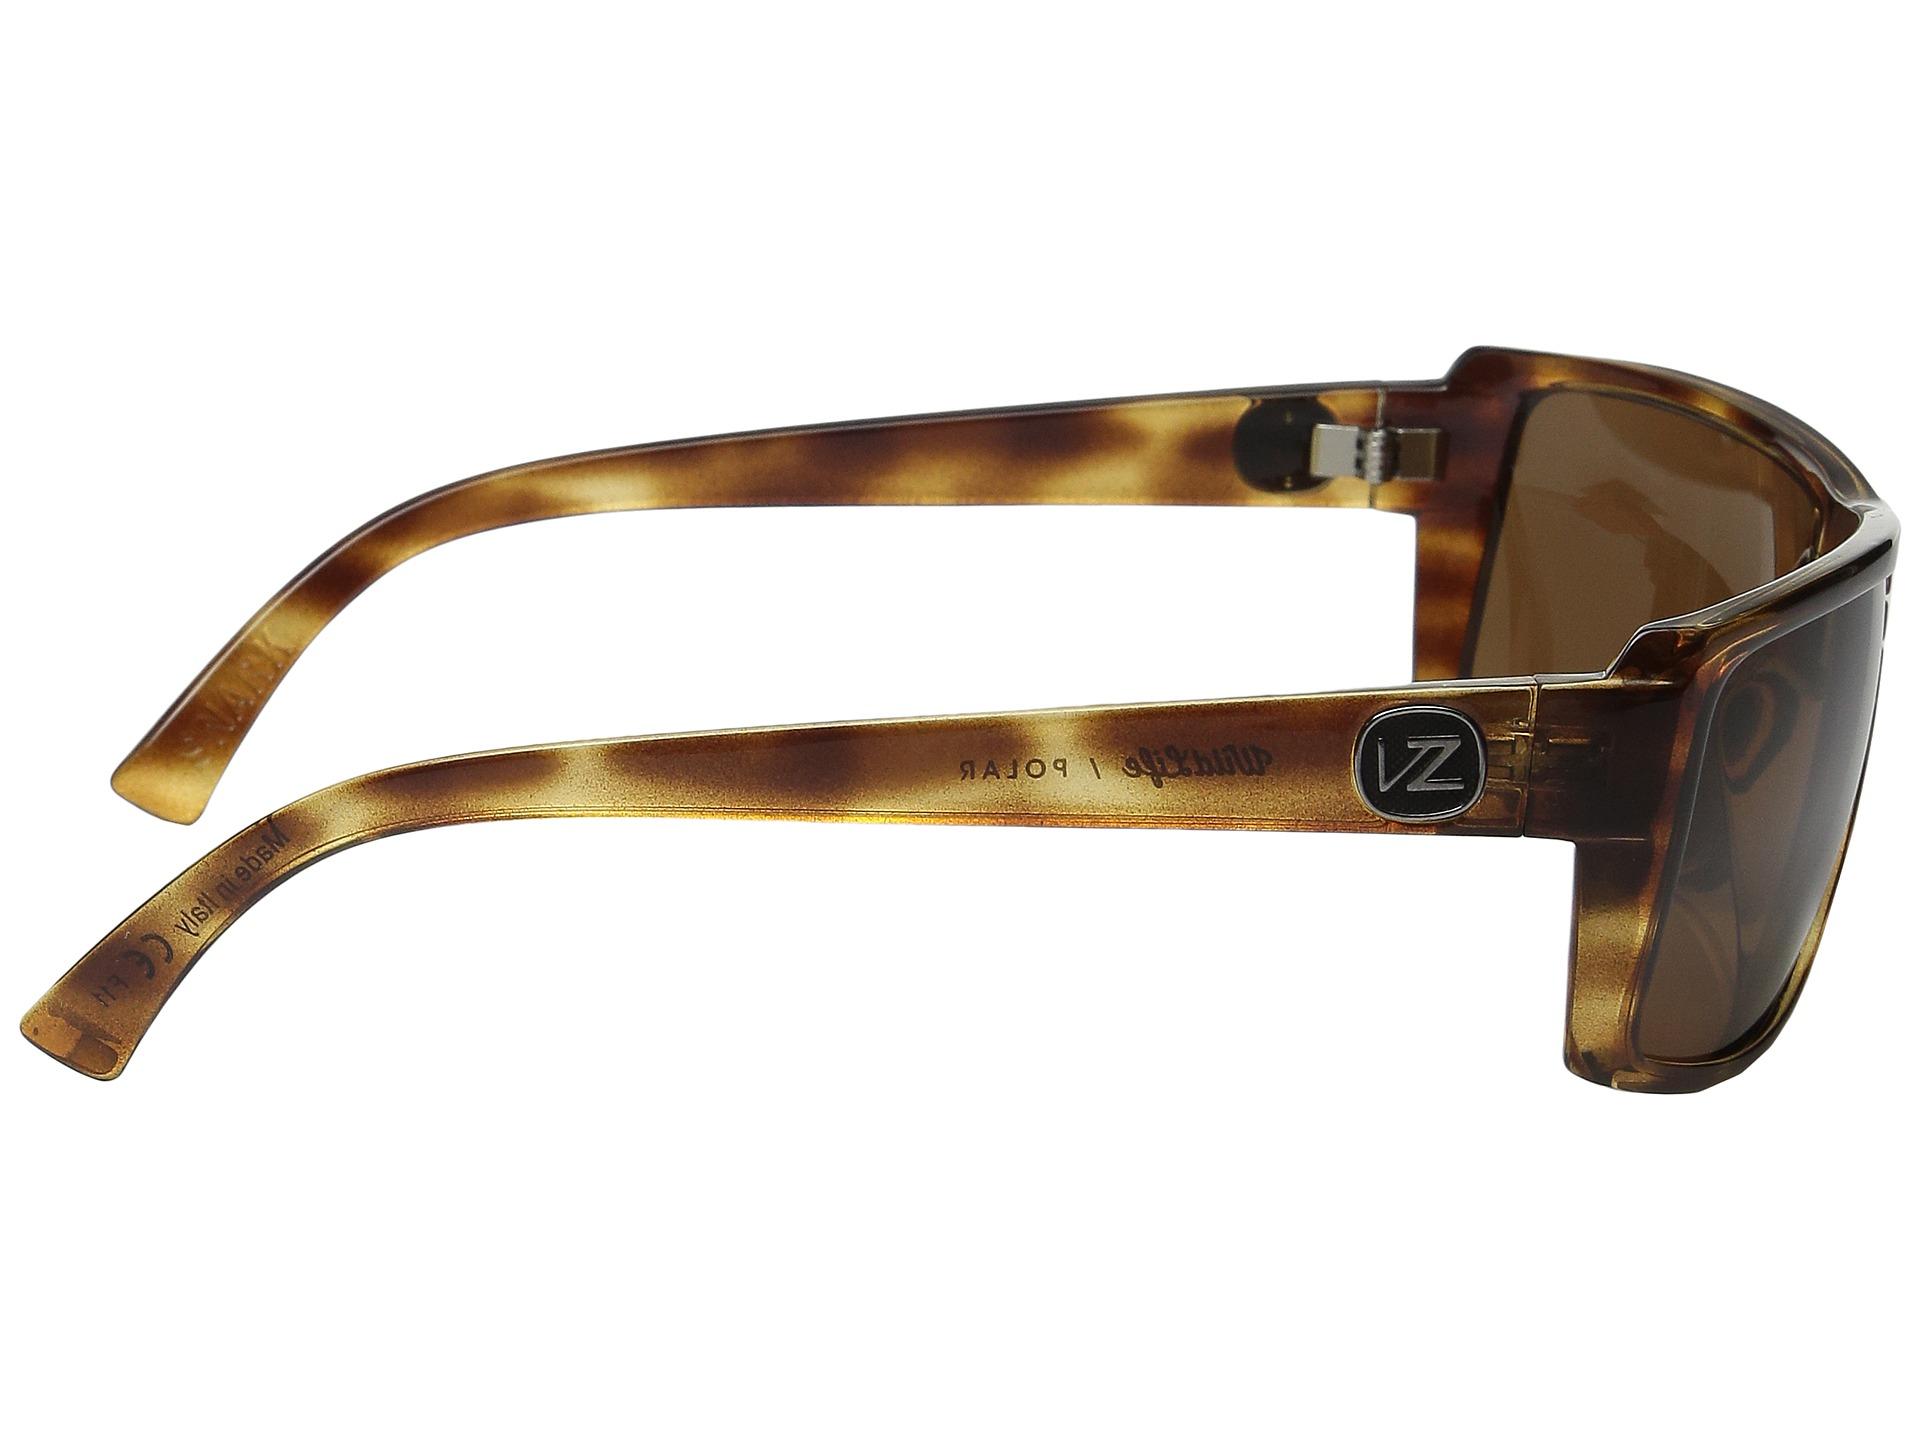 6bb144a026 Von Zipper Sham Sunglasses Polarized Review